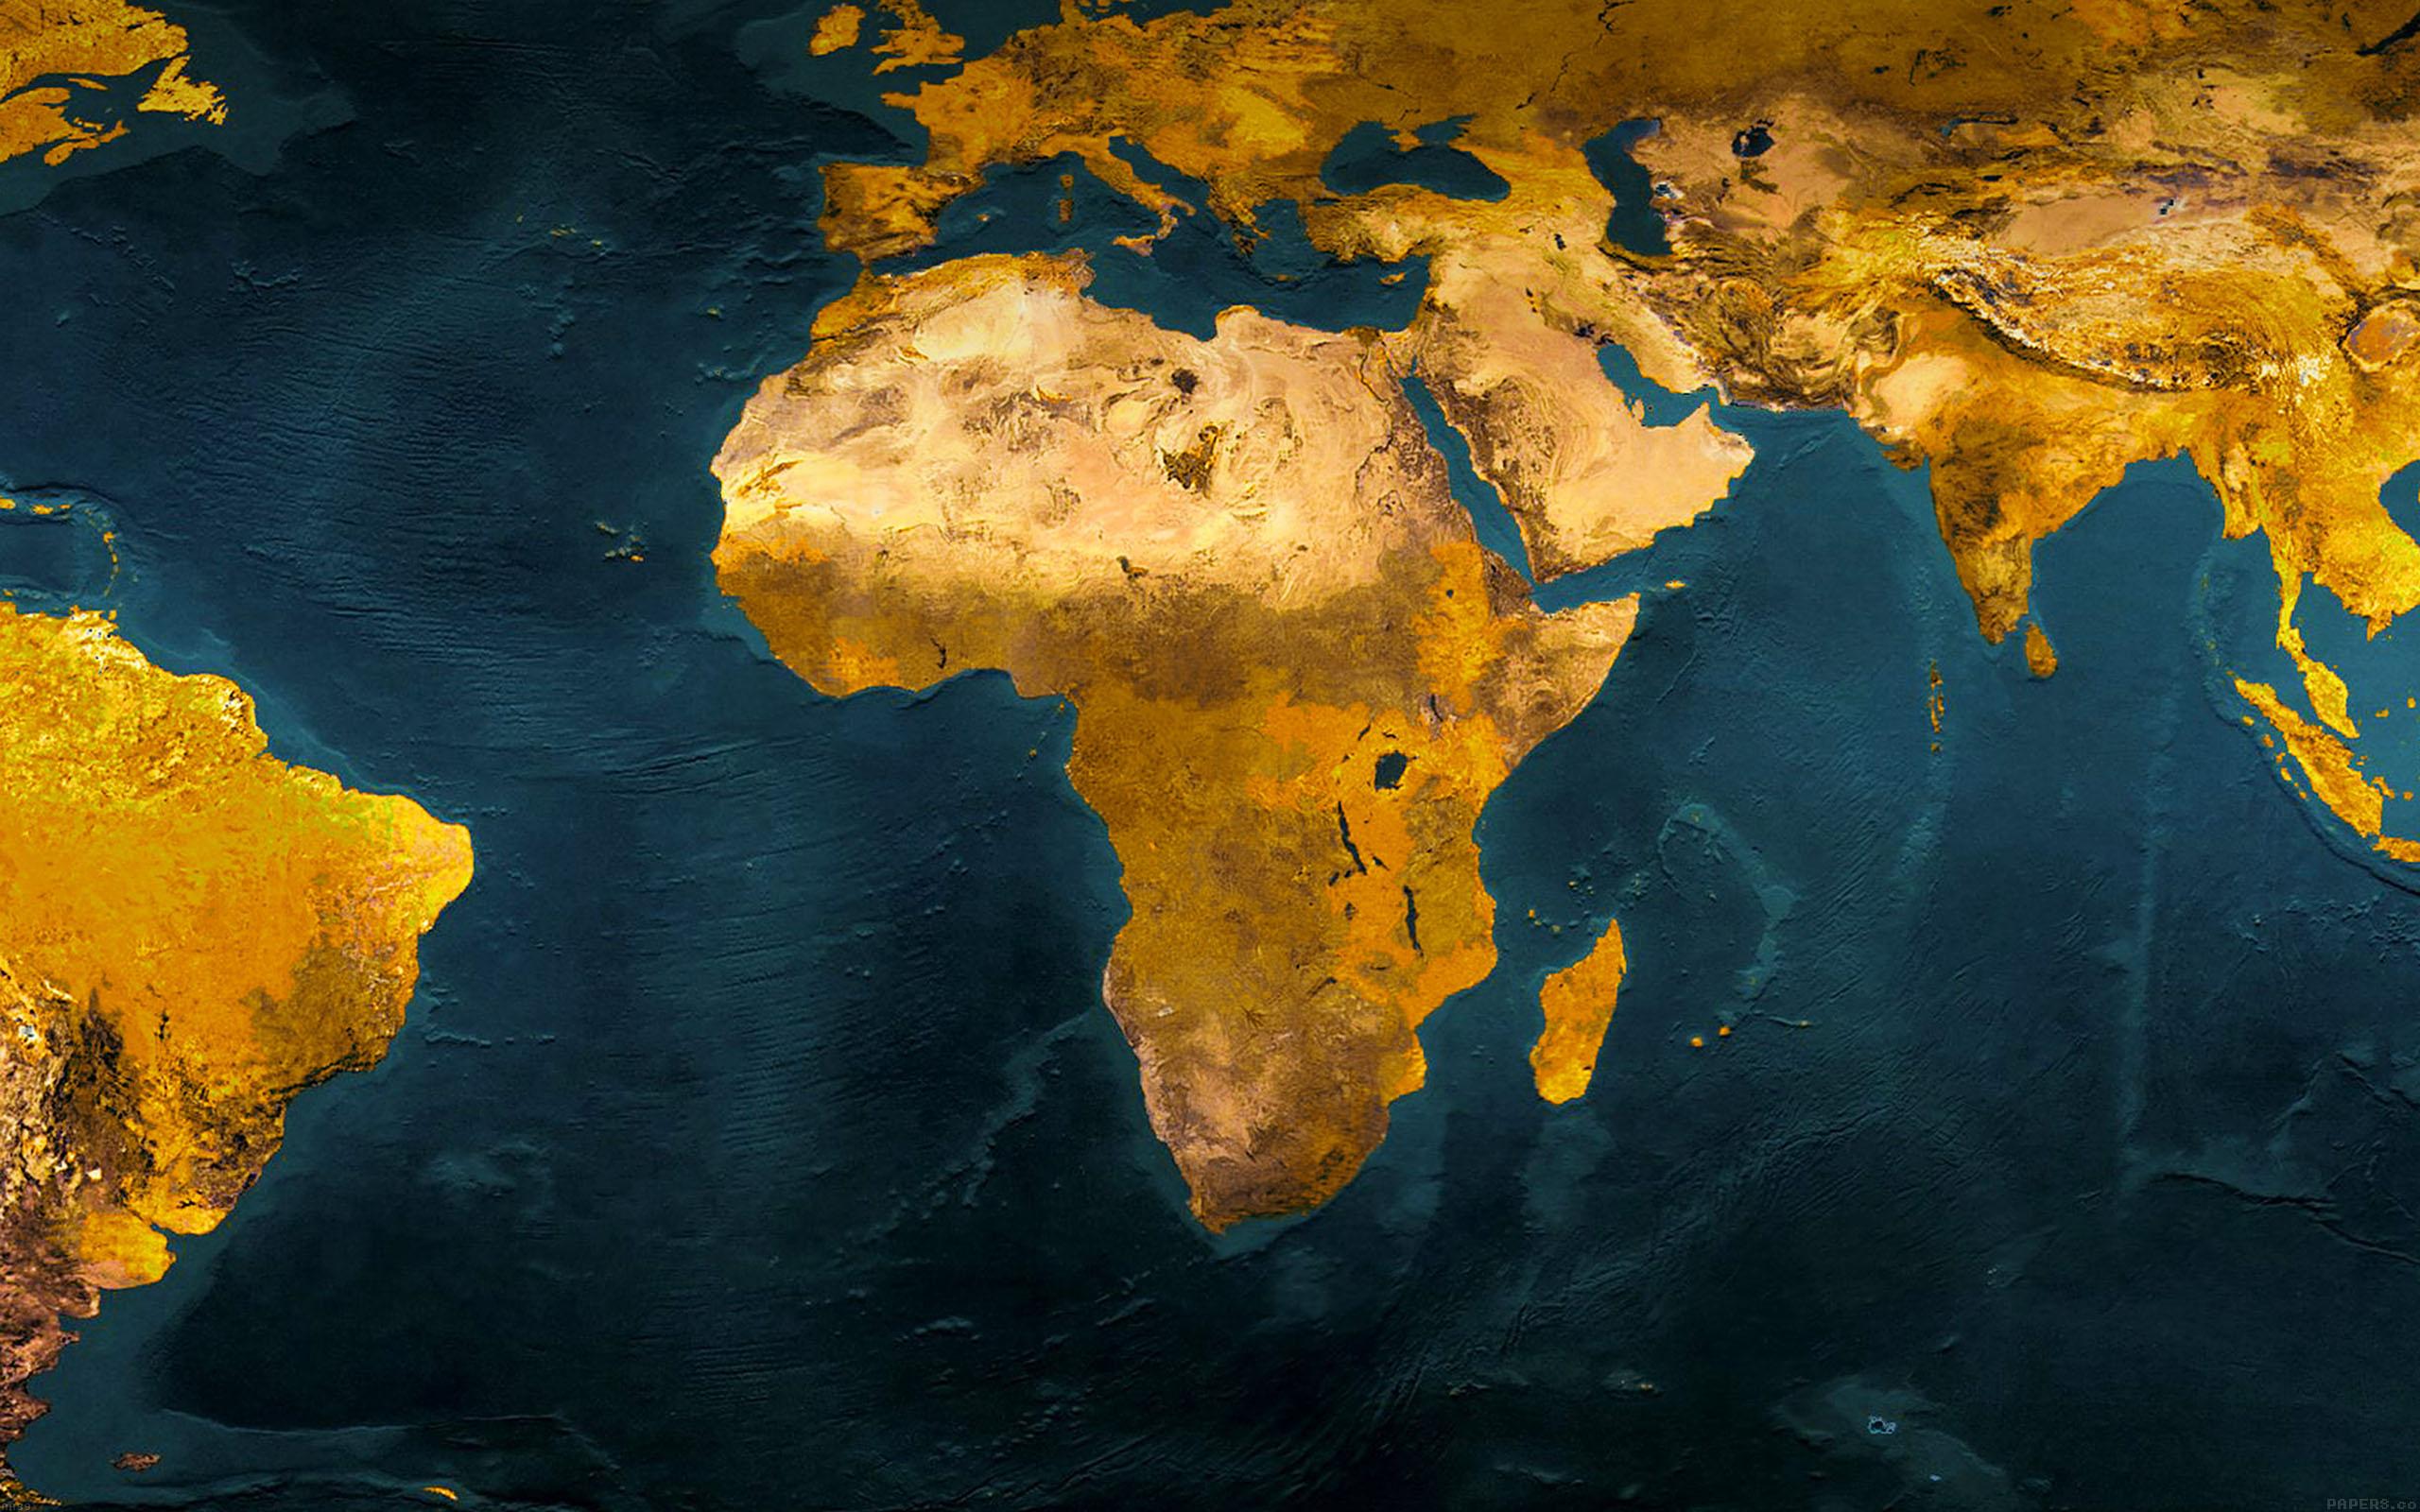 Aa99 wallpaper europe and africa worldmap macbook pro 13 gumiabroncs Choice Image